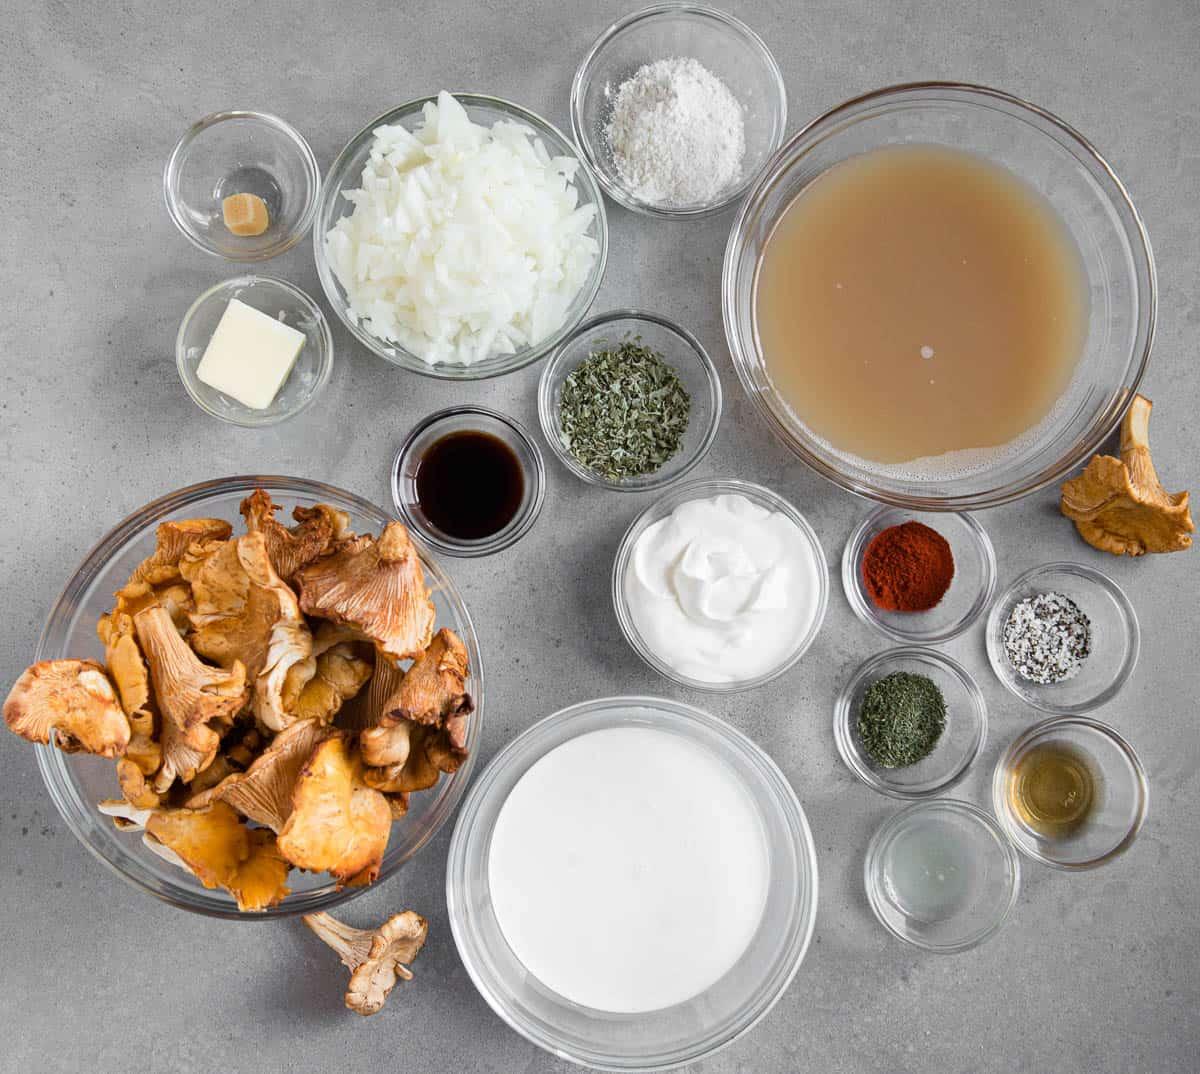 ingredients used to make this Hungarian Mushroom Soup recipe